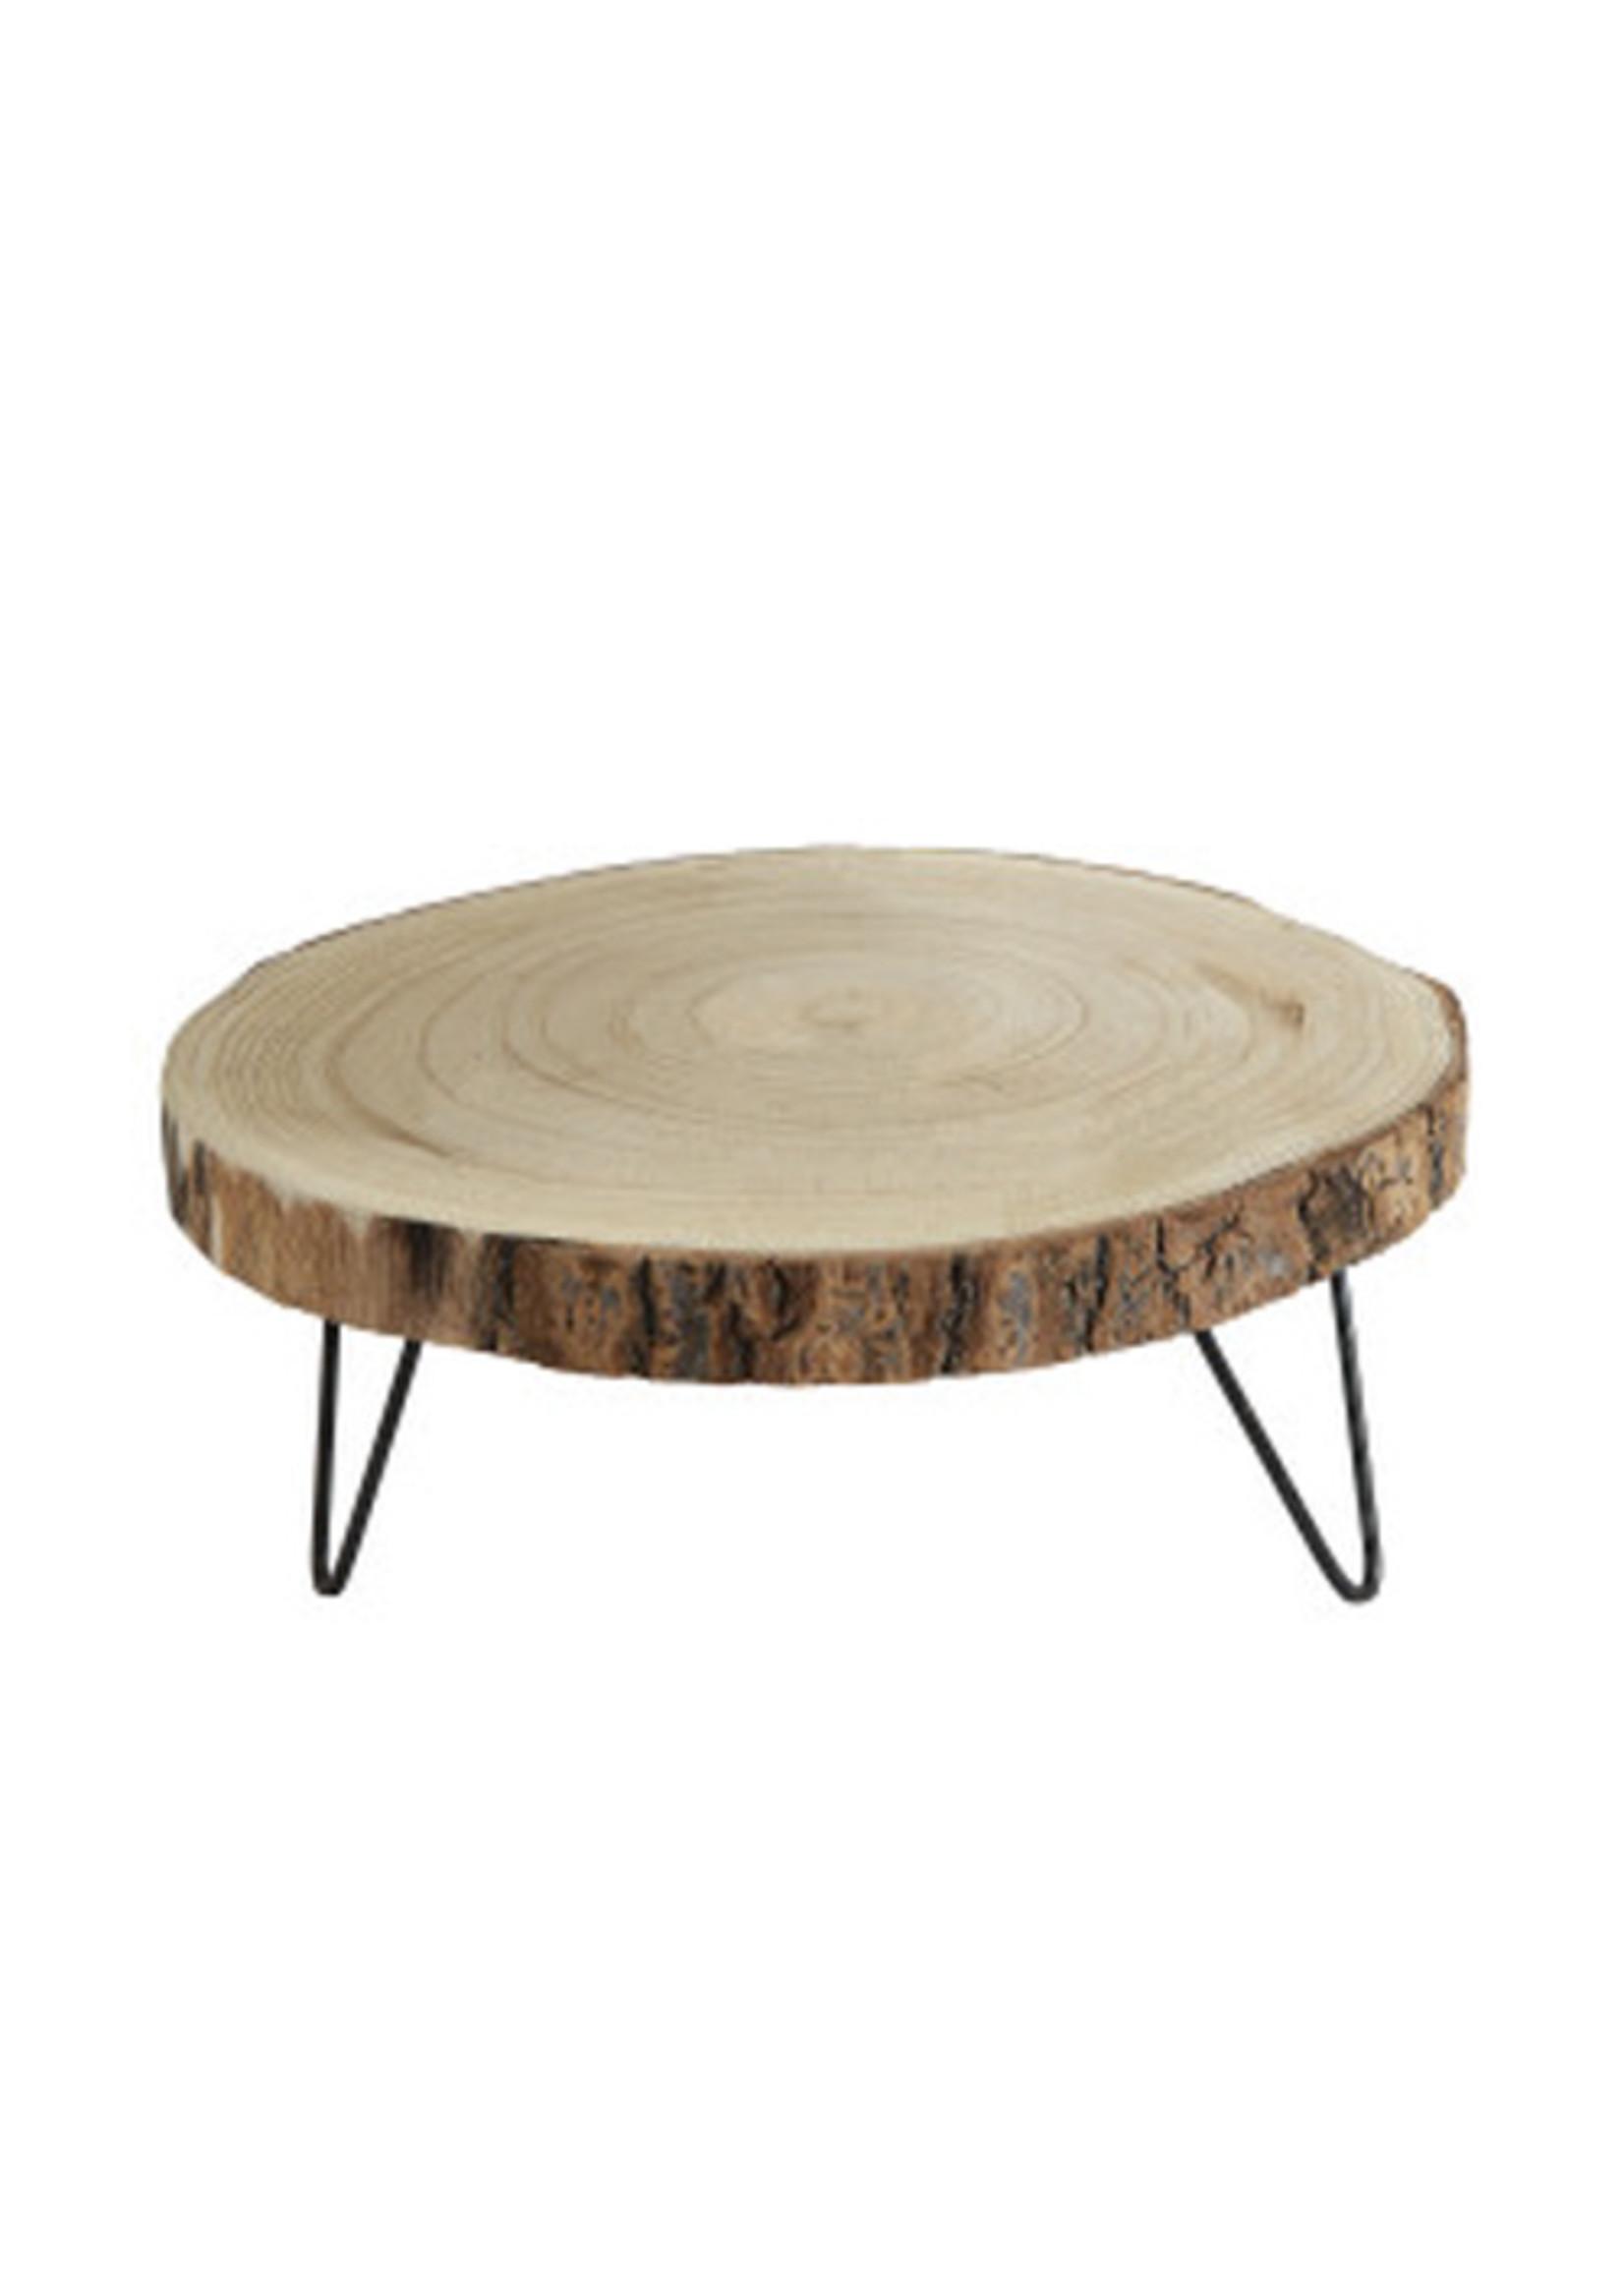 Round Paulowina Wood Pedestal with Metal Legs